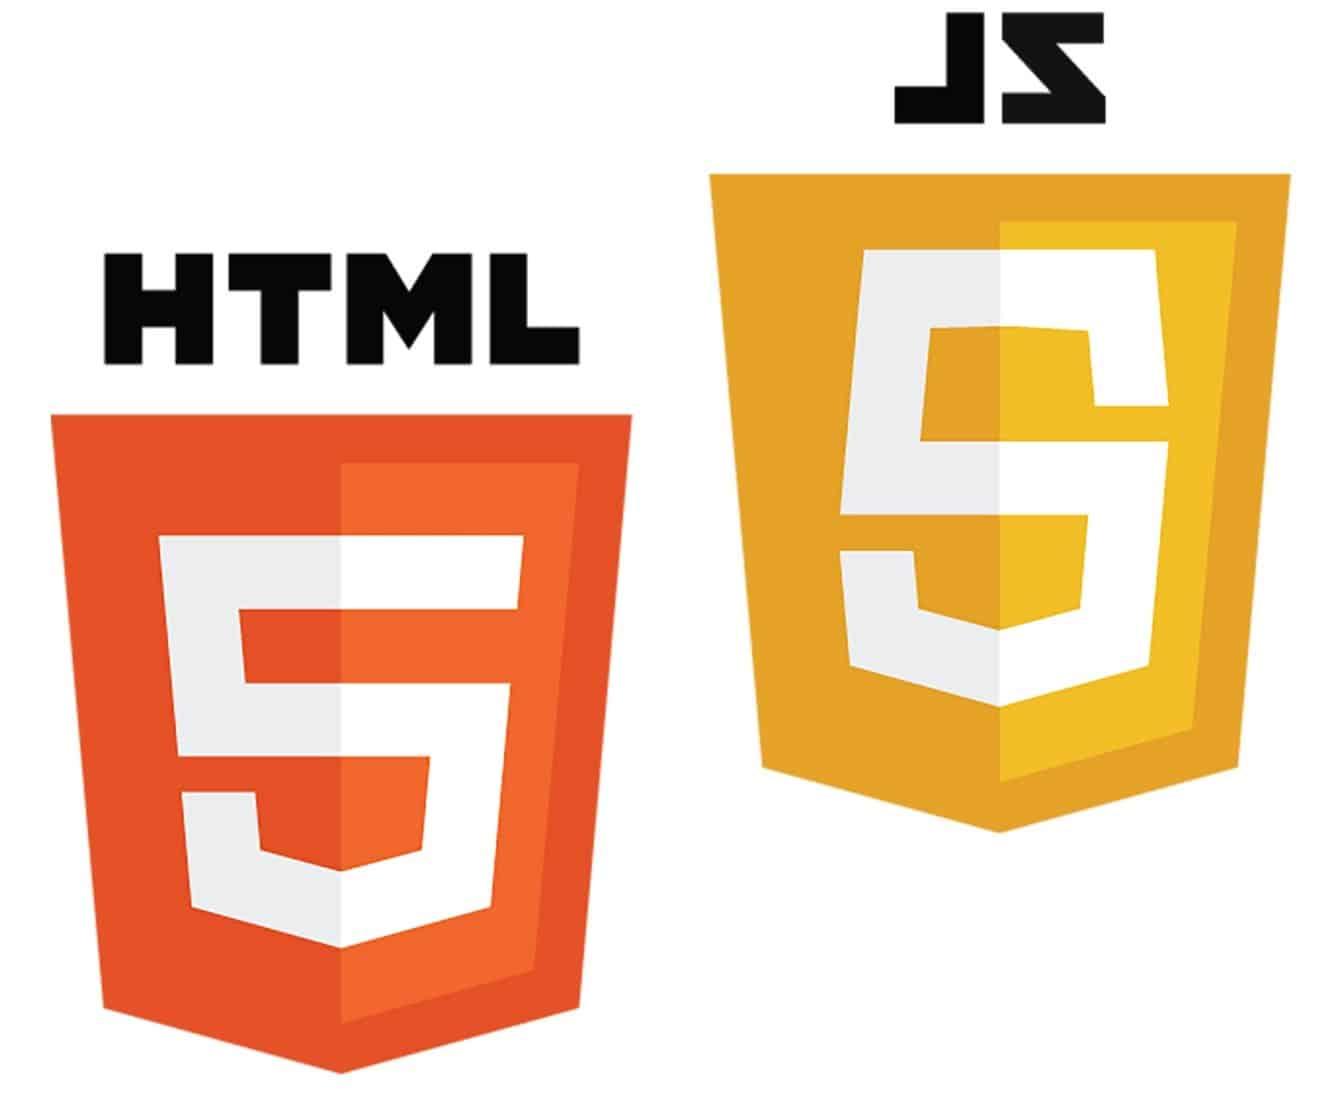 HTML and JS logos